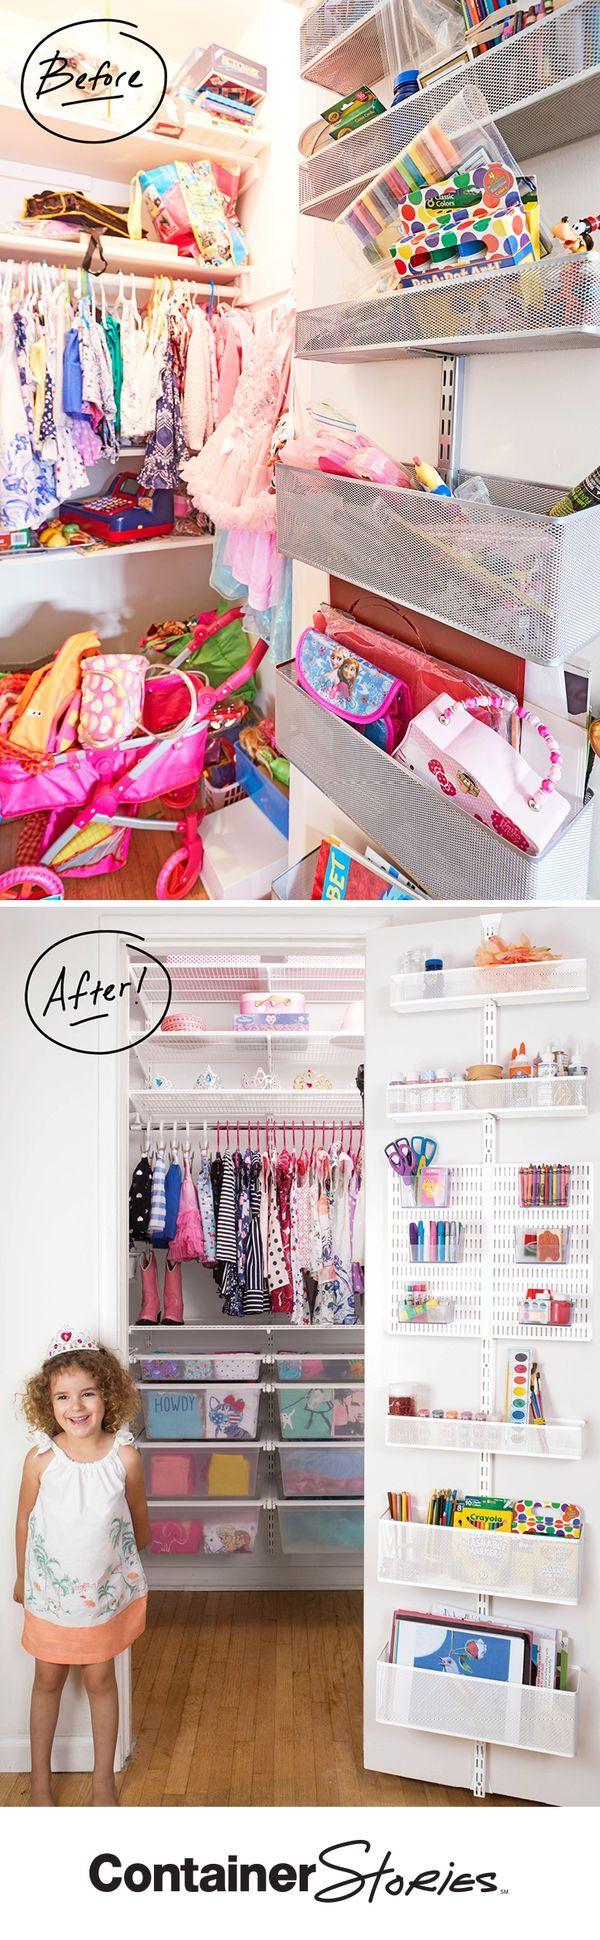 We turned closet chaos into a closet fit for a princess